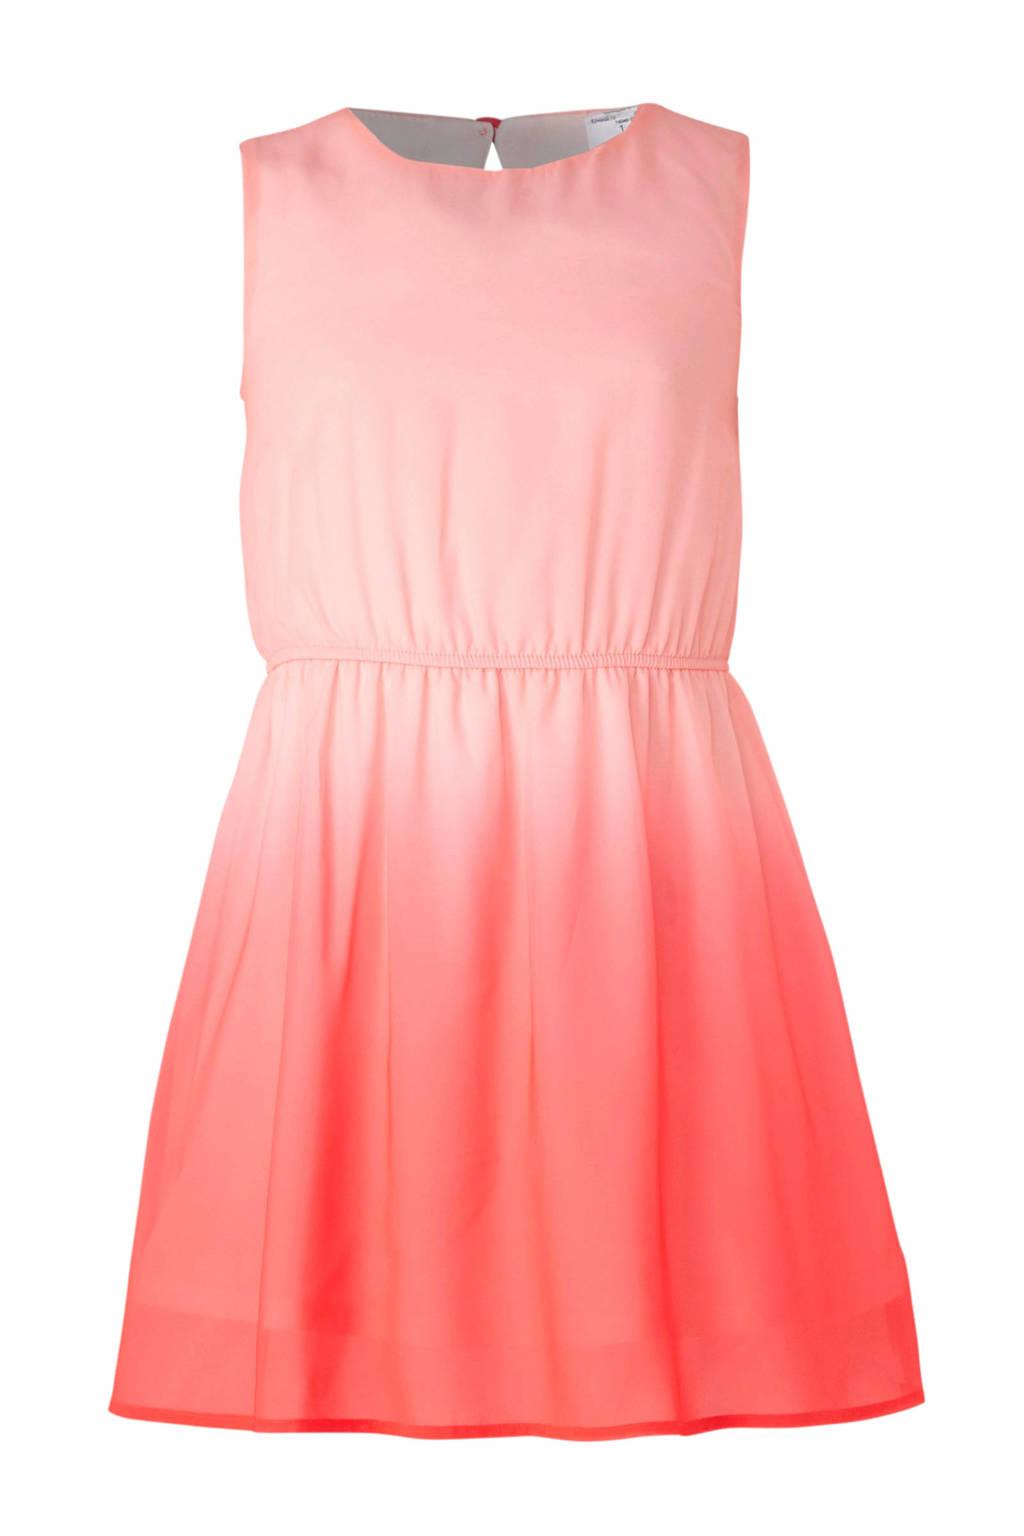 C&A Here & There jurk met dip-dye print roze, Roze